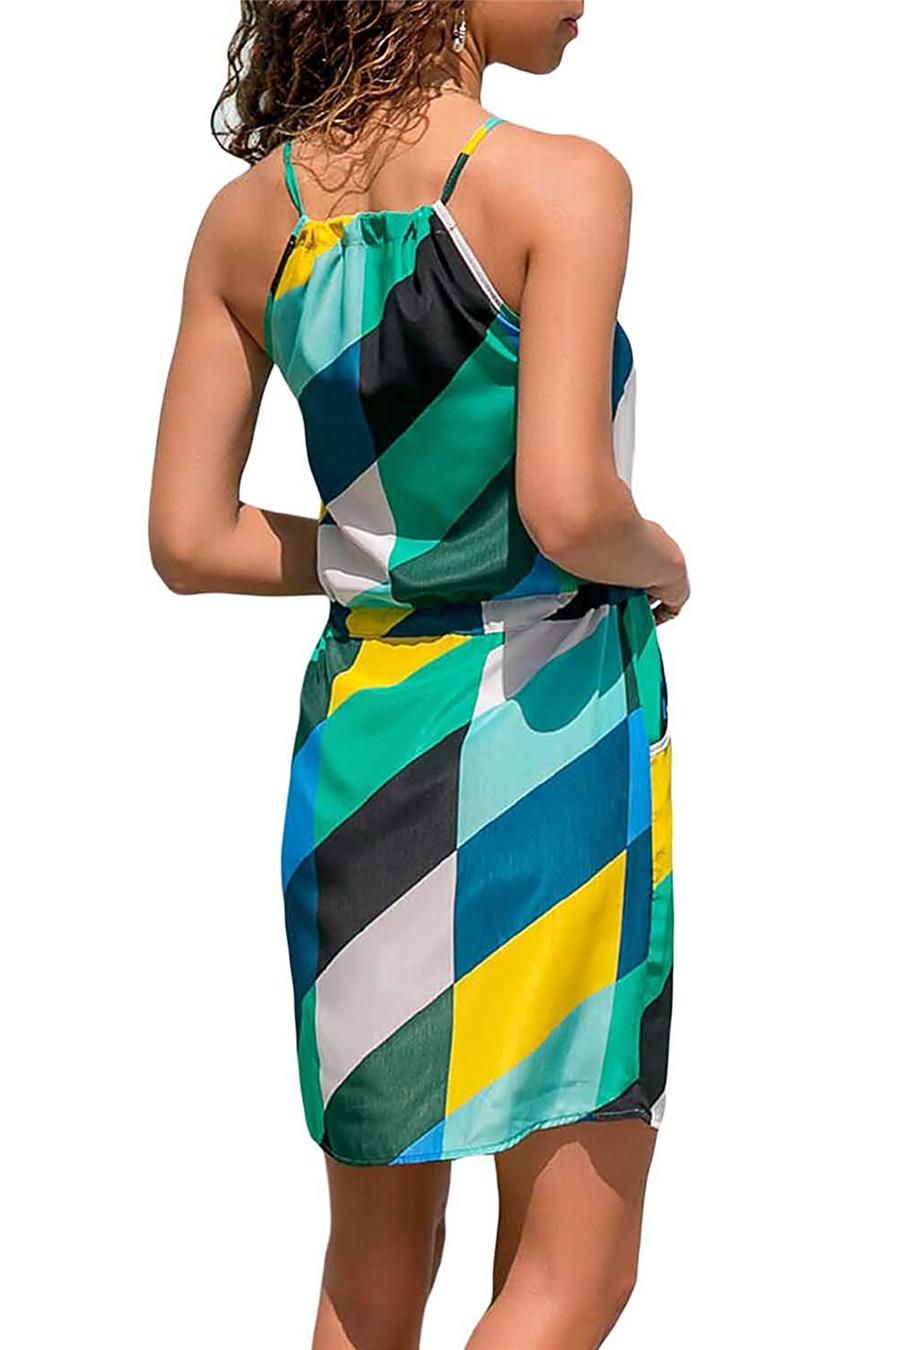 Gladiolus Chiffon Women Summer Dress Spaghetti Strap Floral Print Pocket Sexy Bohemian Beach Dress 2019 Short Ladies Dresses (34)